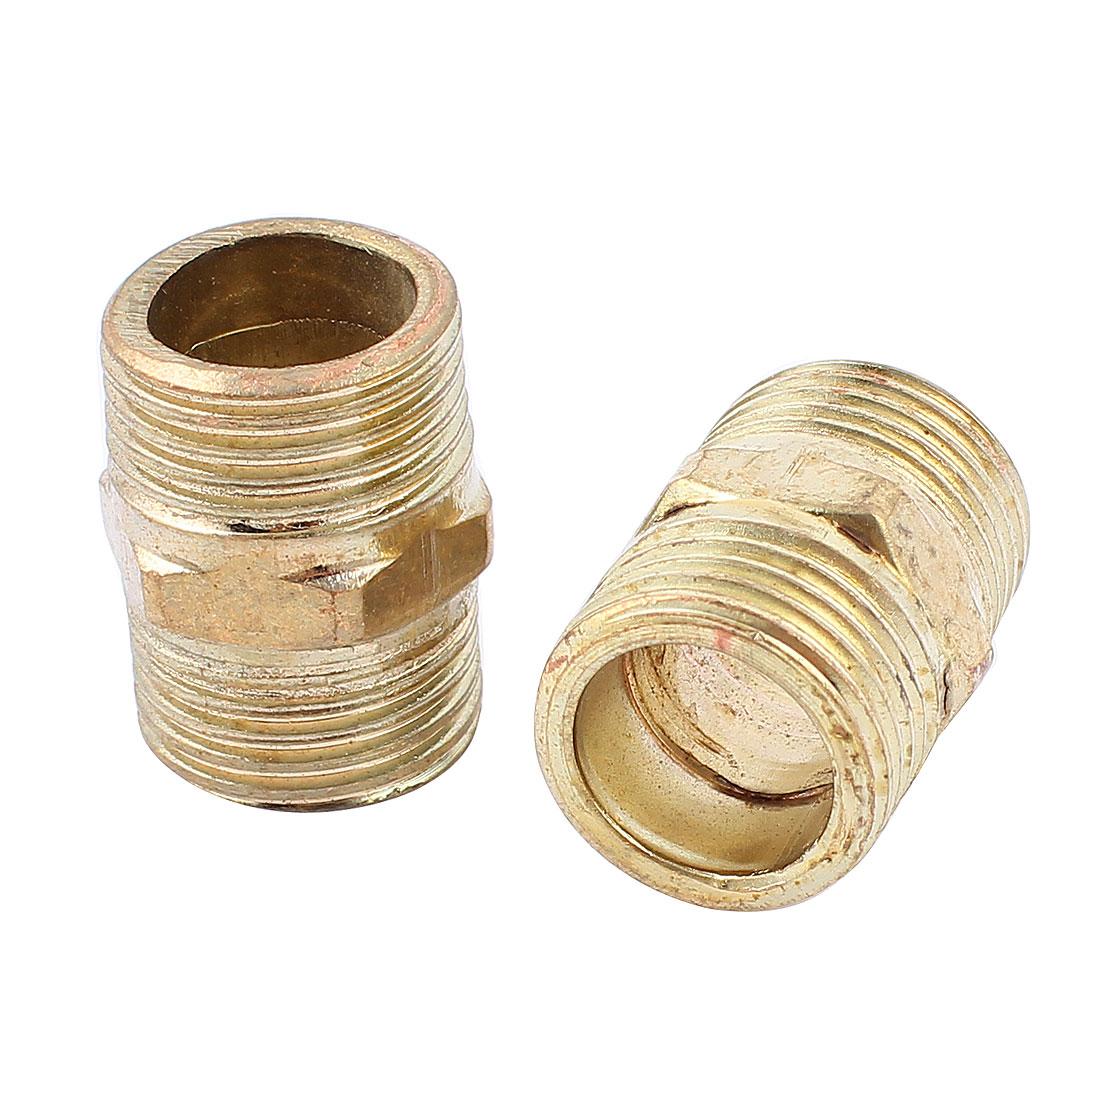 2Pcs Gold Tone Brass 1/2BSP x 1/2BSP Male Hex Nipple Connector Adapter 27mm Long